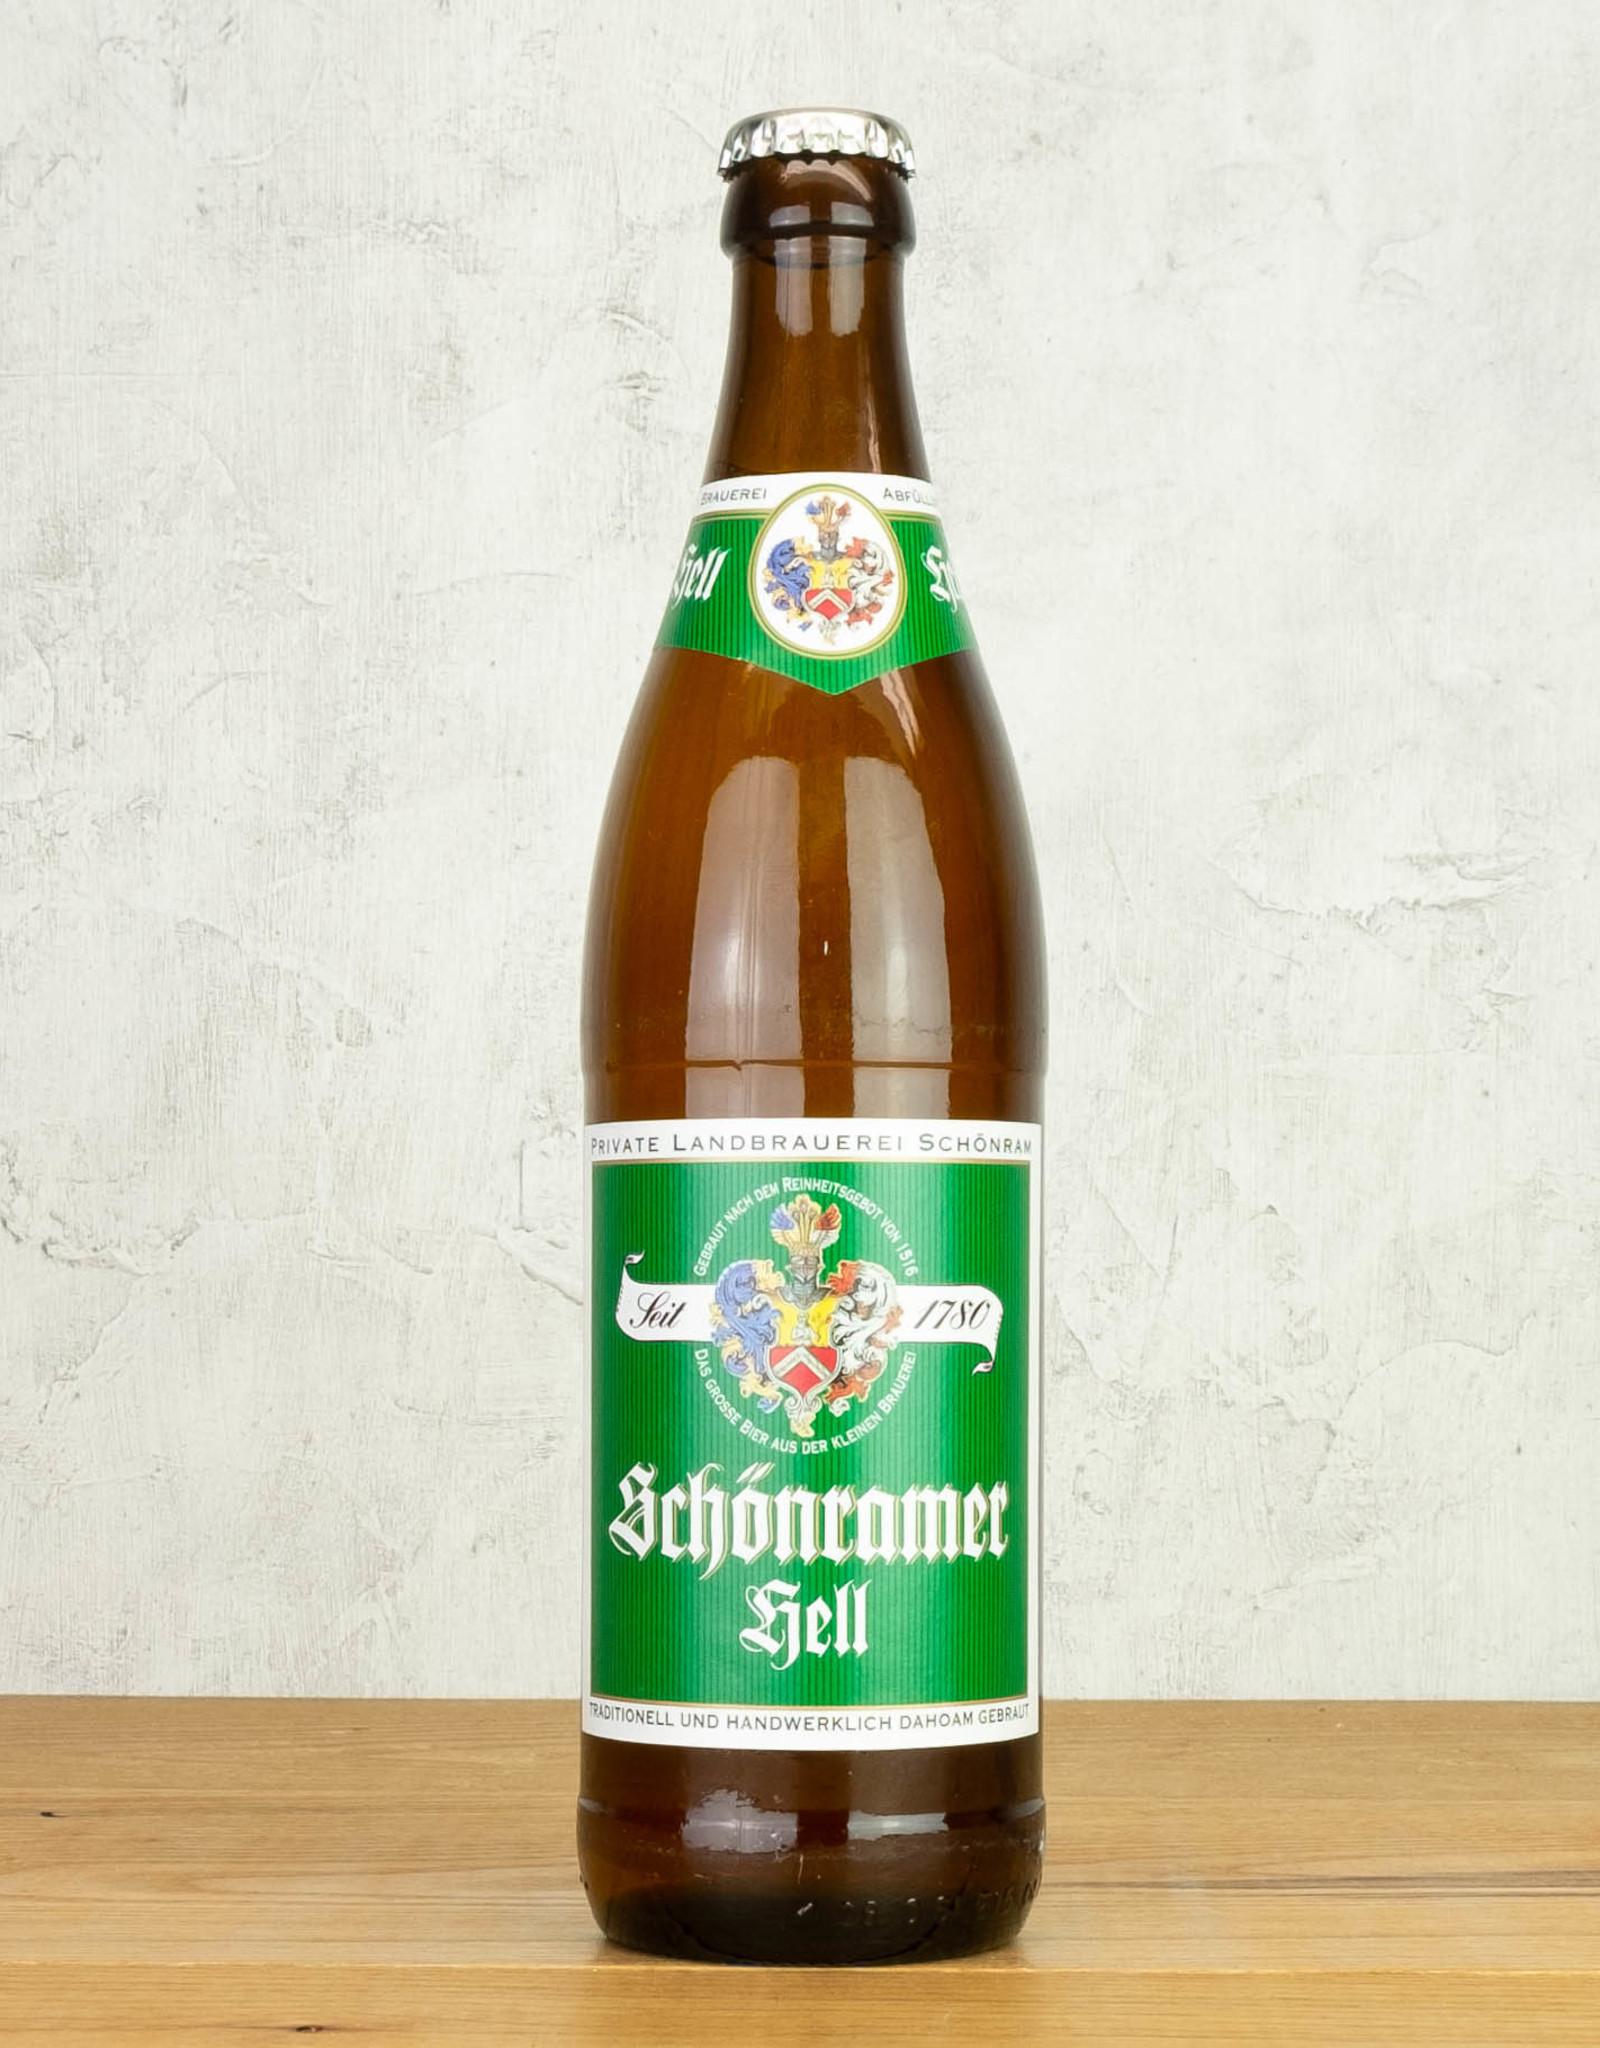 Schonramer Hell Single